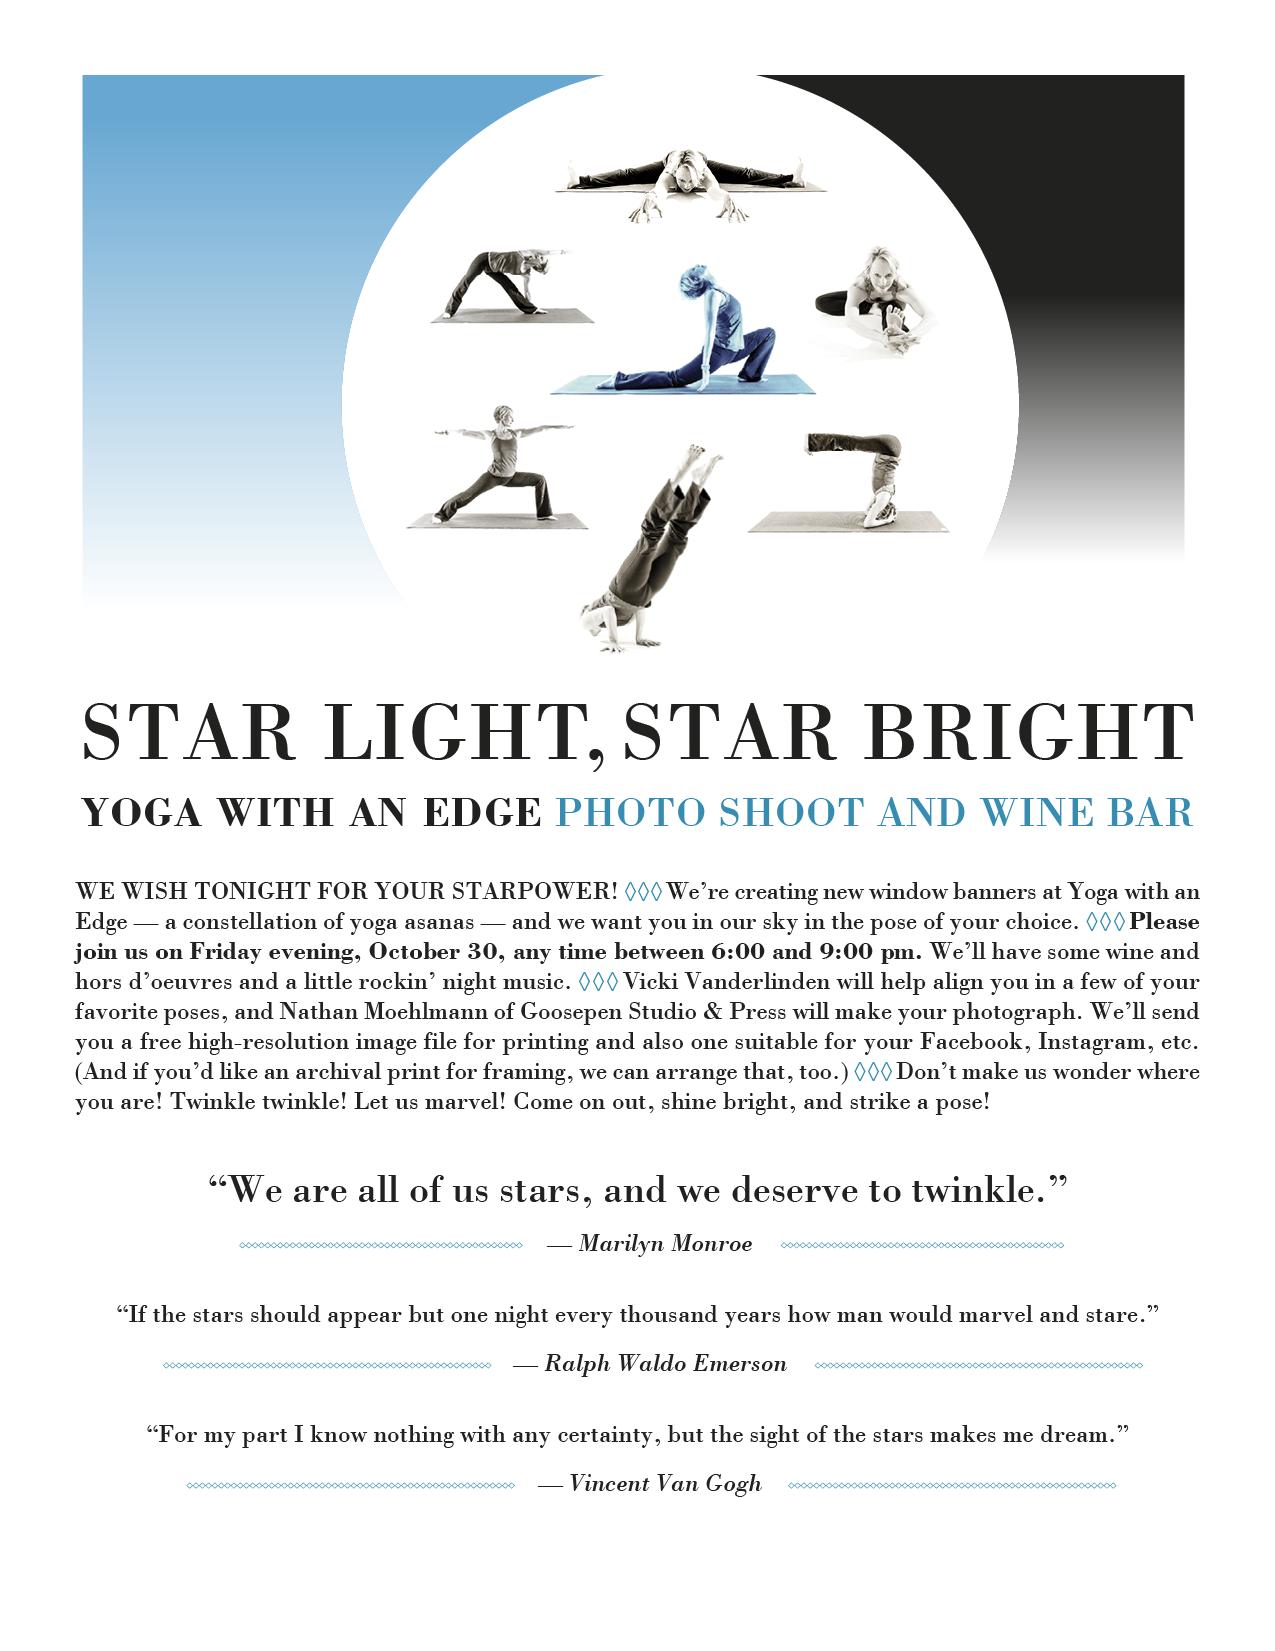 Yoga_with_an_Edge_Photo_Shoot-web